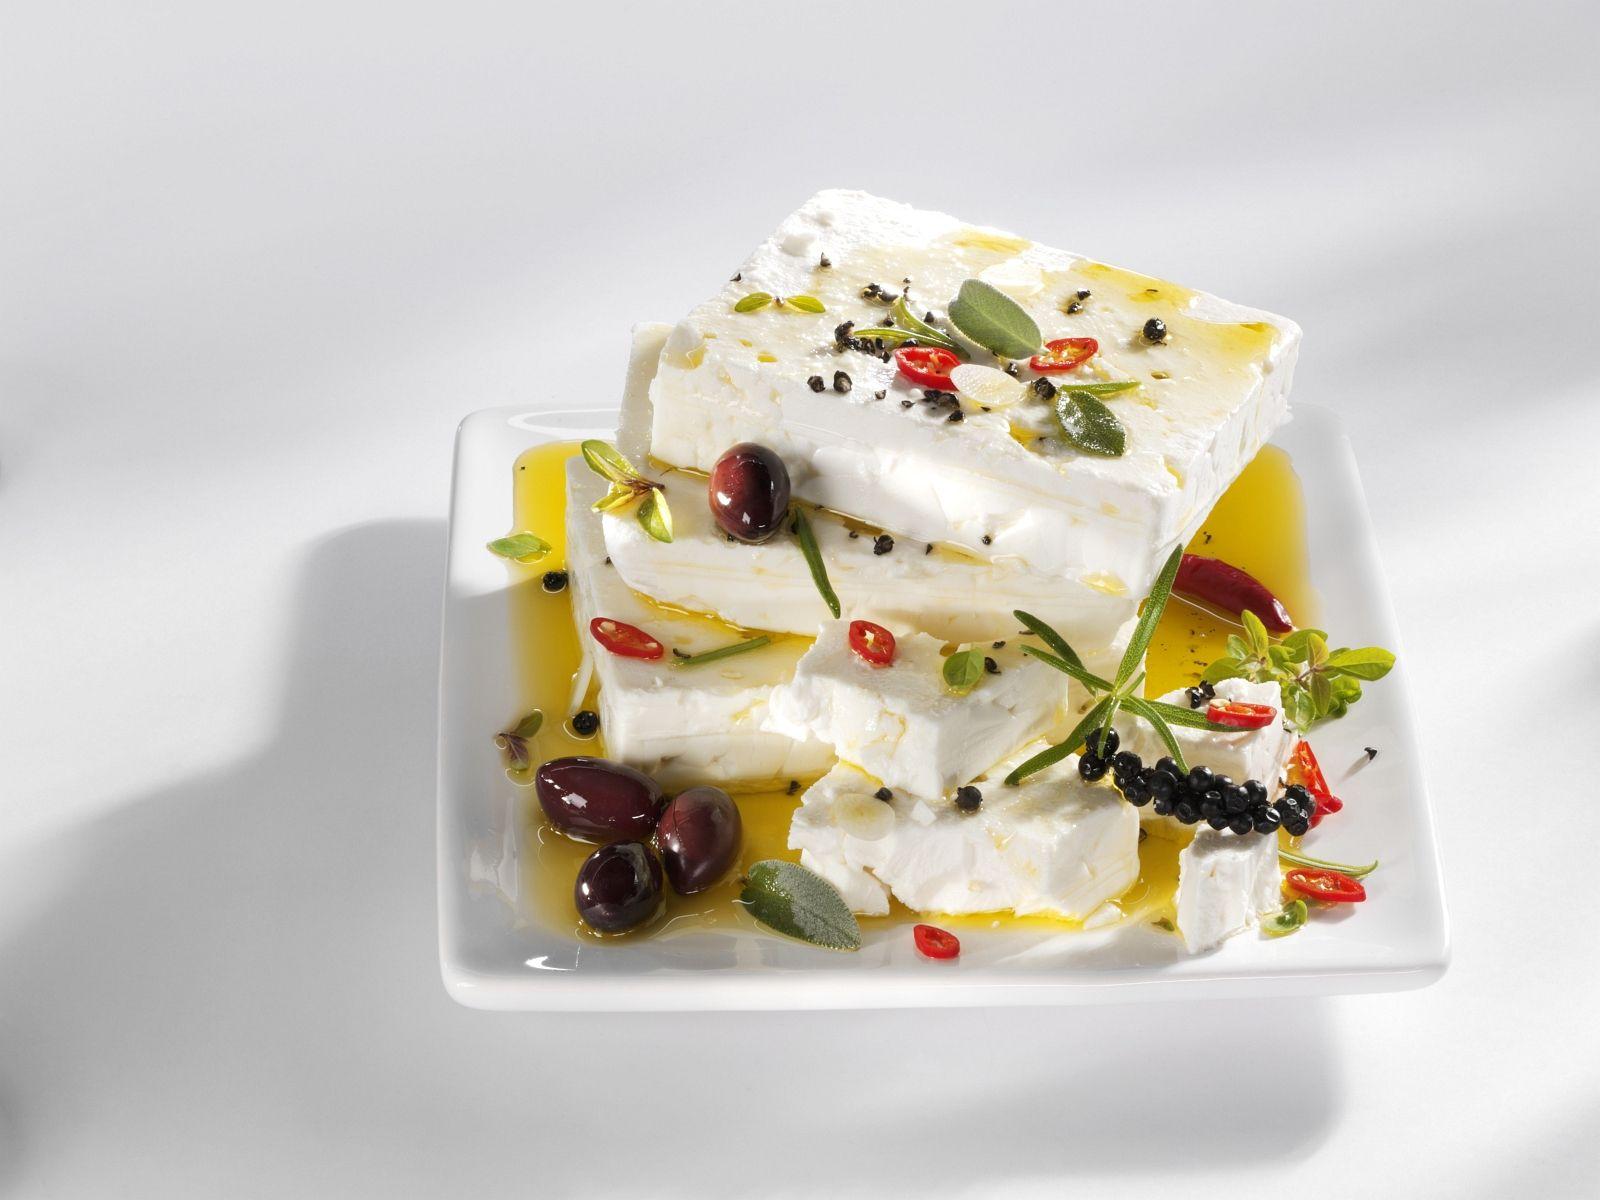 Zeytinyağında Marine Edilmiş Beyaz Peynir